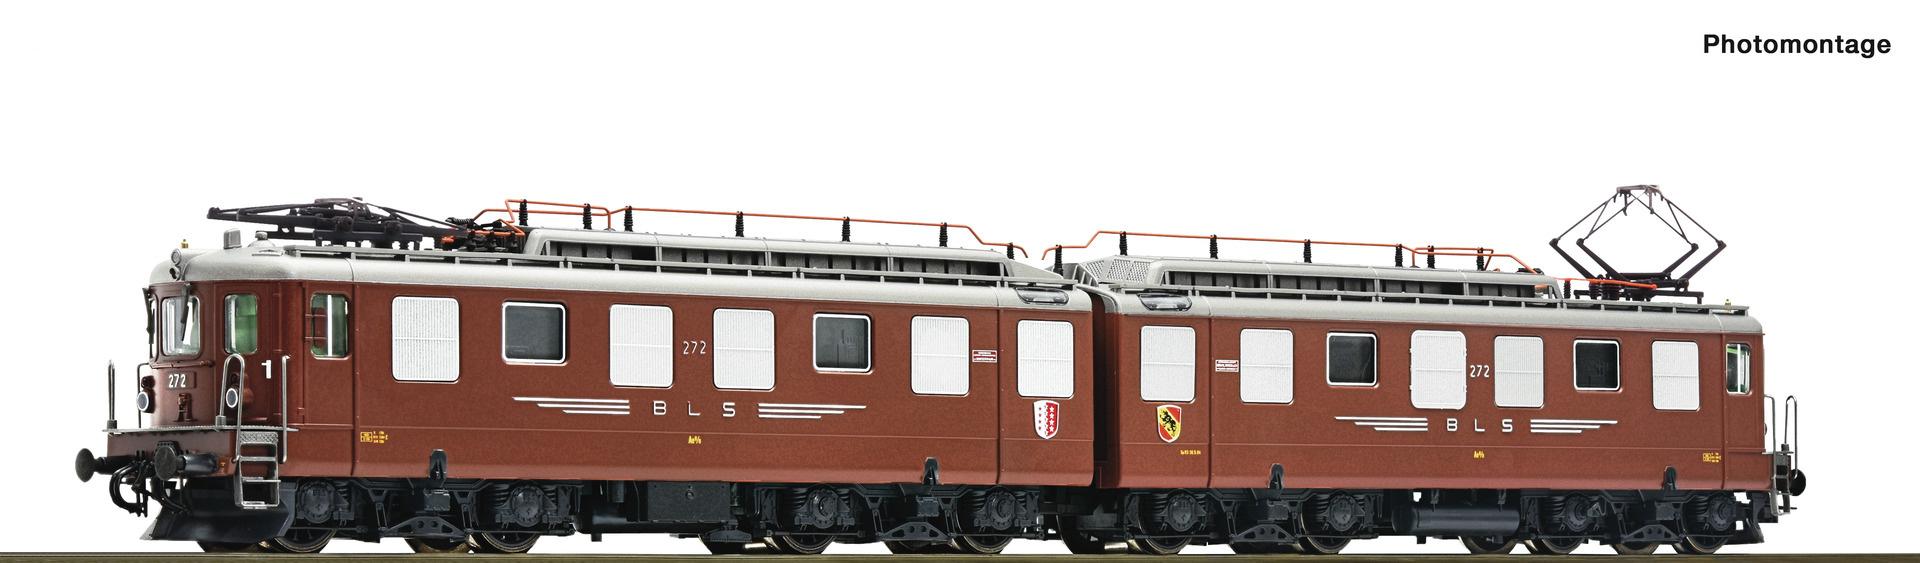 72690 E-Lok Ae 8/8 BLS-1